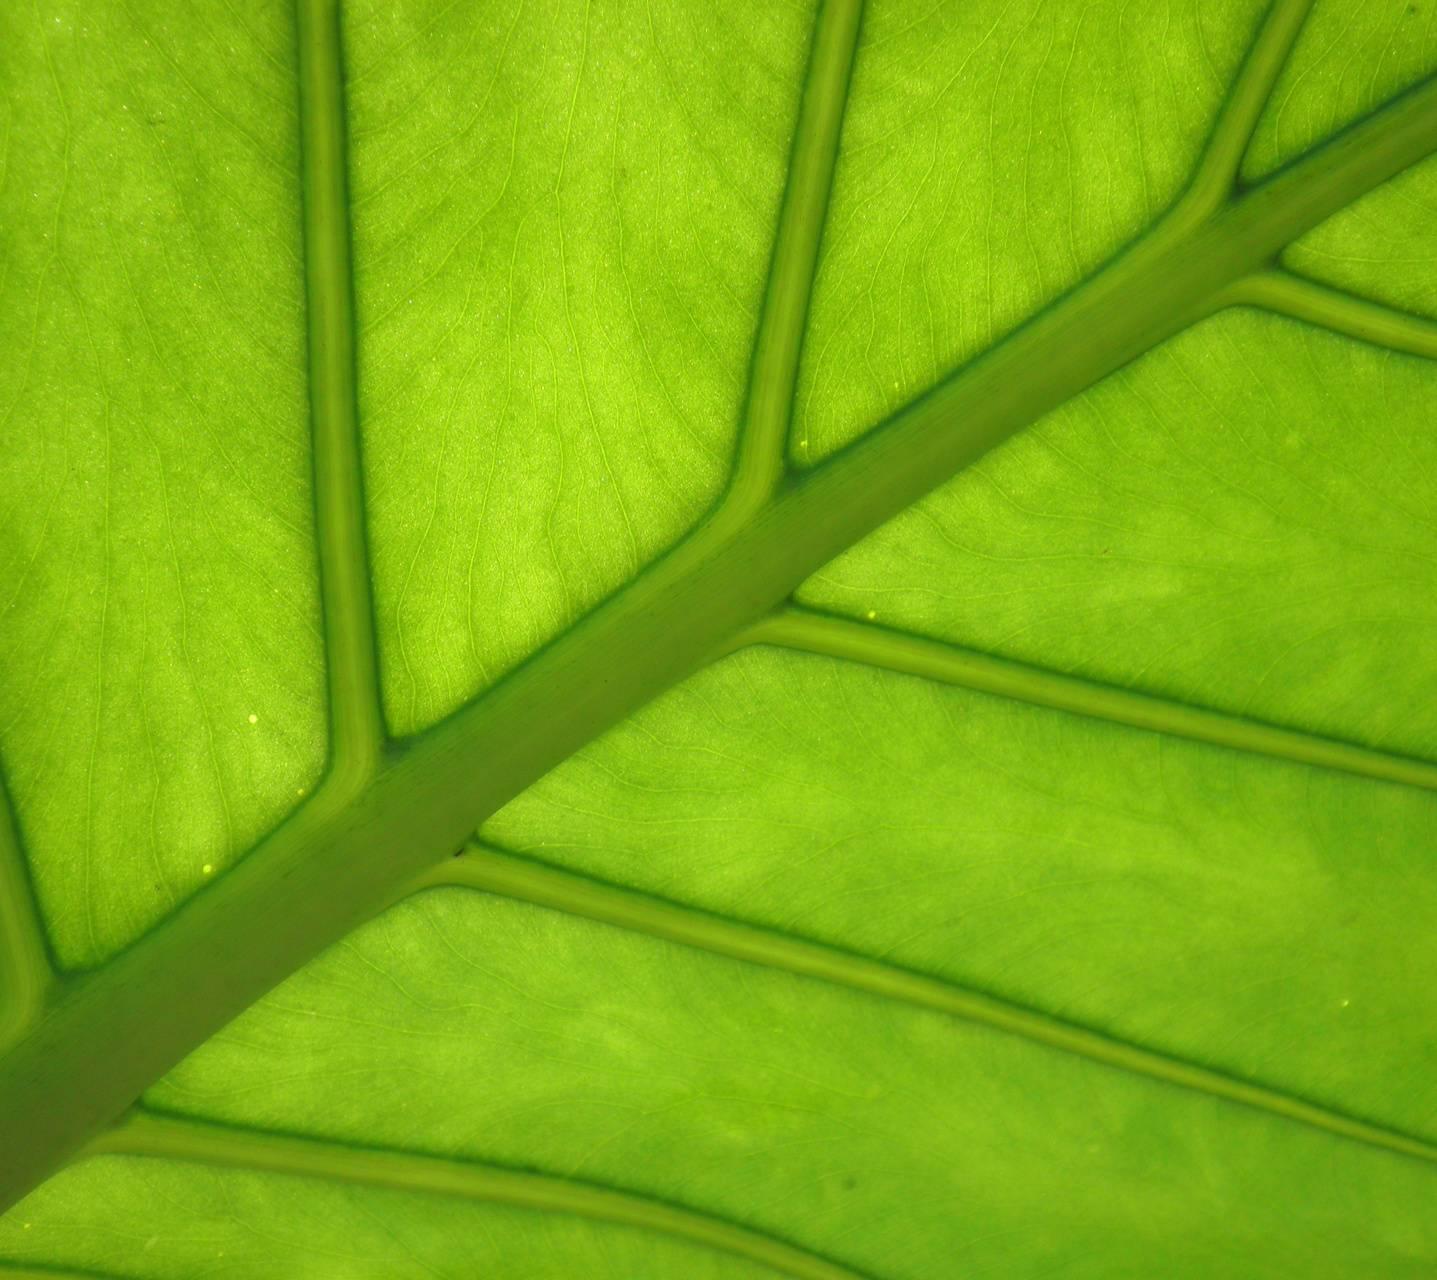 Back of a leaf